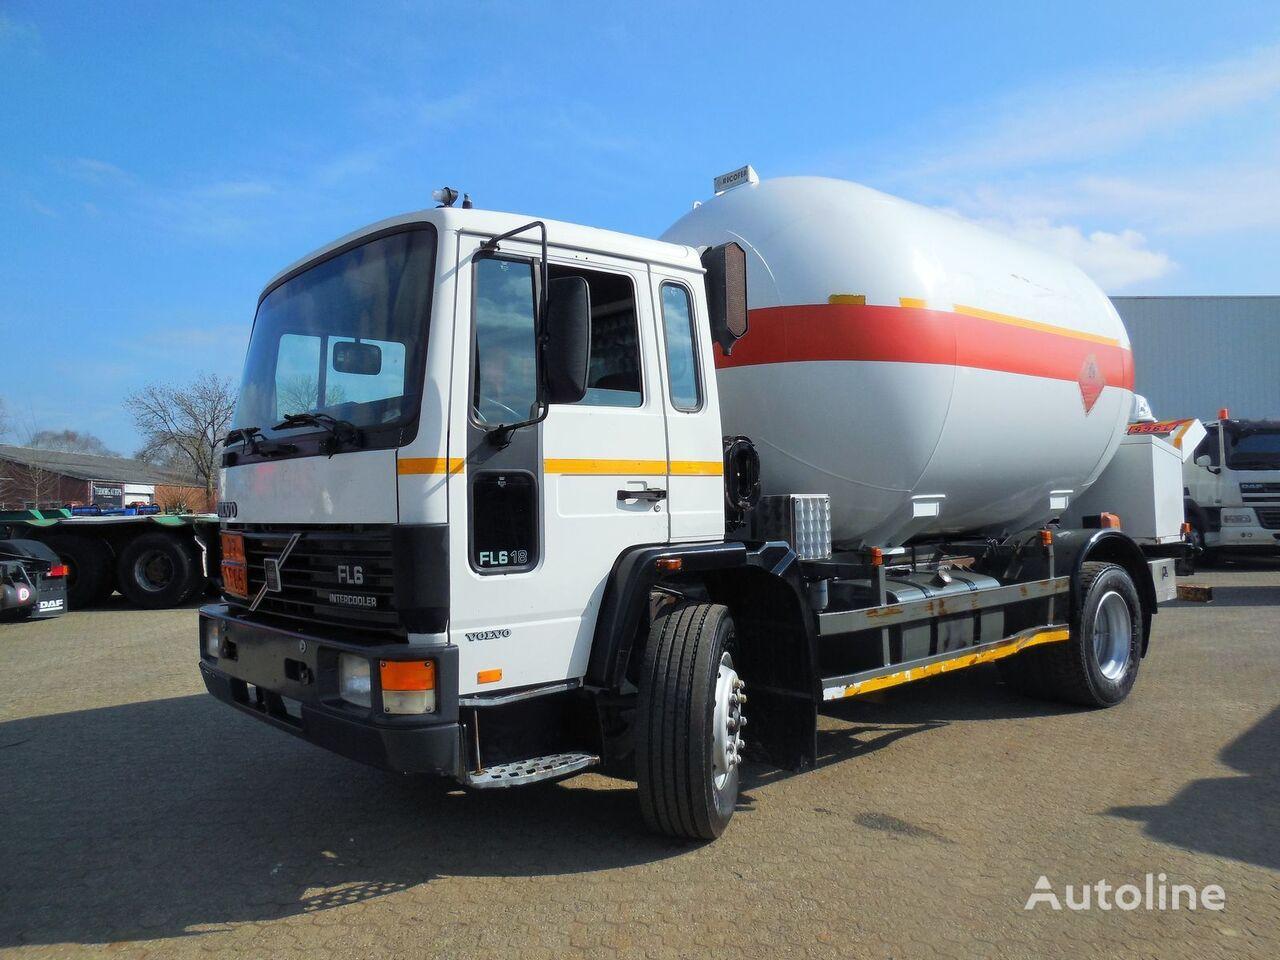 VOLVO Volvo GAS 17.000 - FL618 - P27BH - GPL gas tank truck